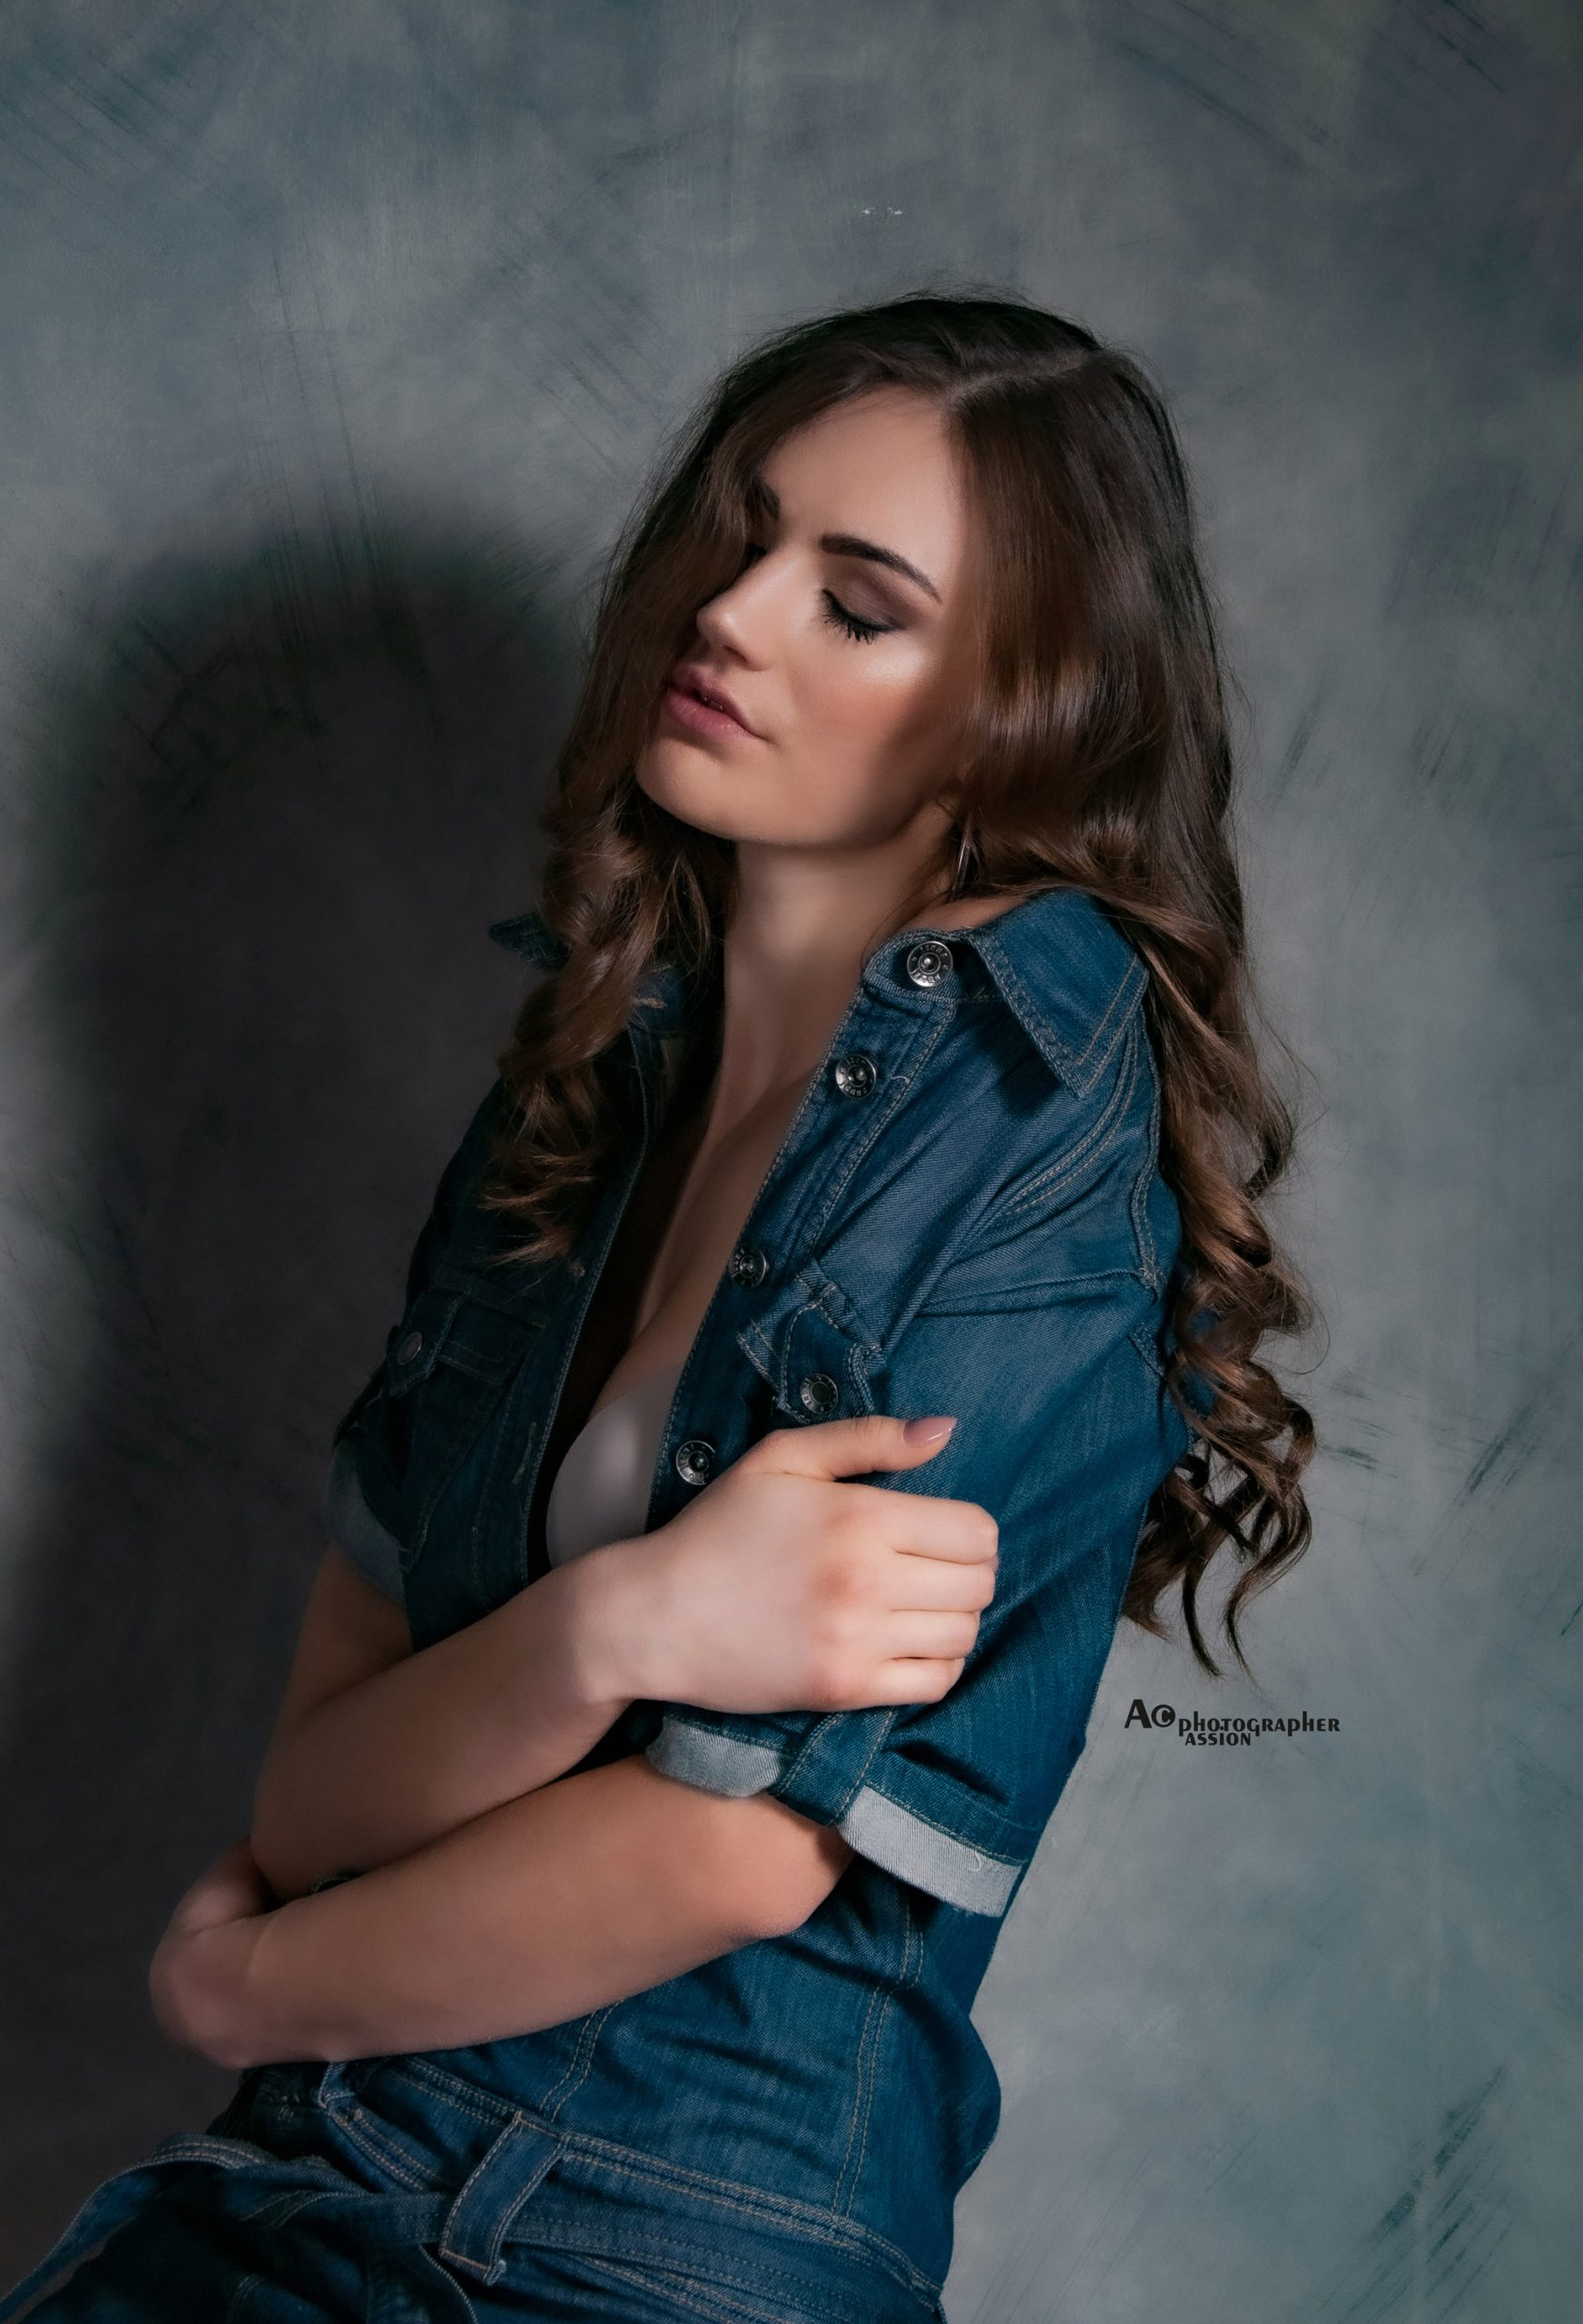 Categorie: Fashion, Glamour, Portrait; Photographer: ALESSIO CUNEGO; Model:DENYSA KOLYA; Location: Trend Studio, Via Giovanni da Milano, Milano, MI